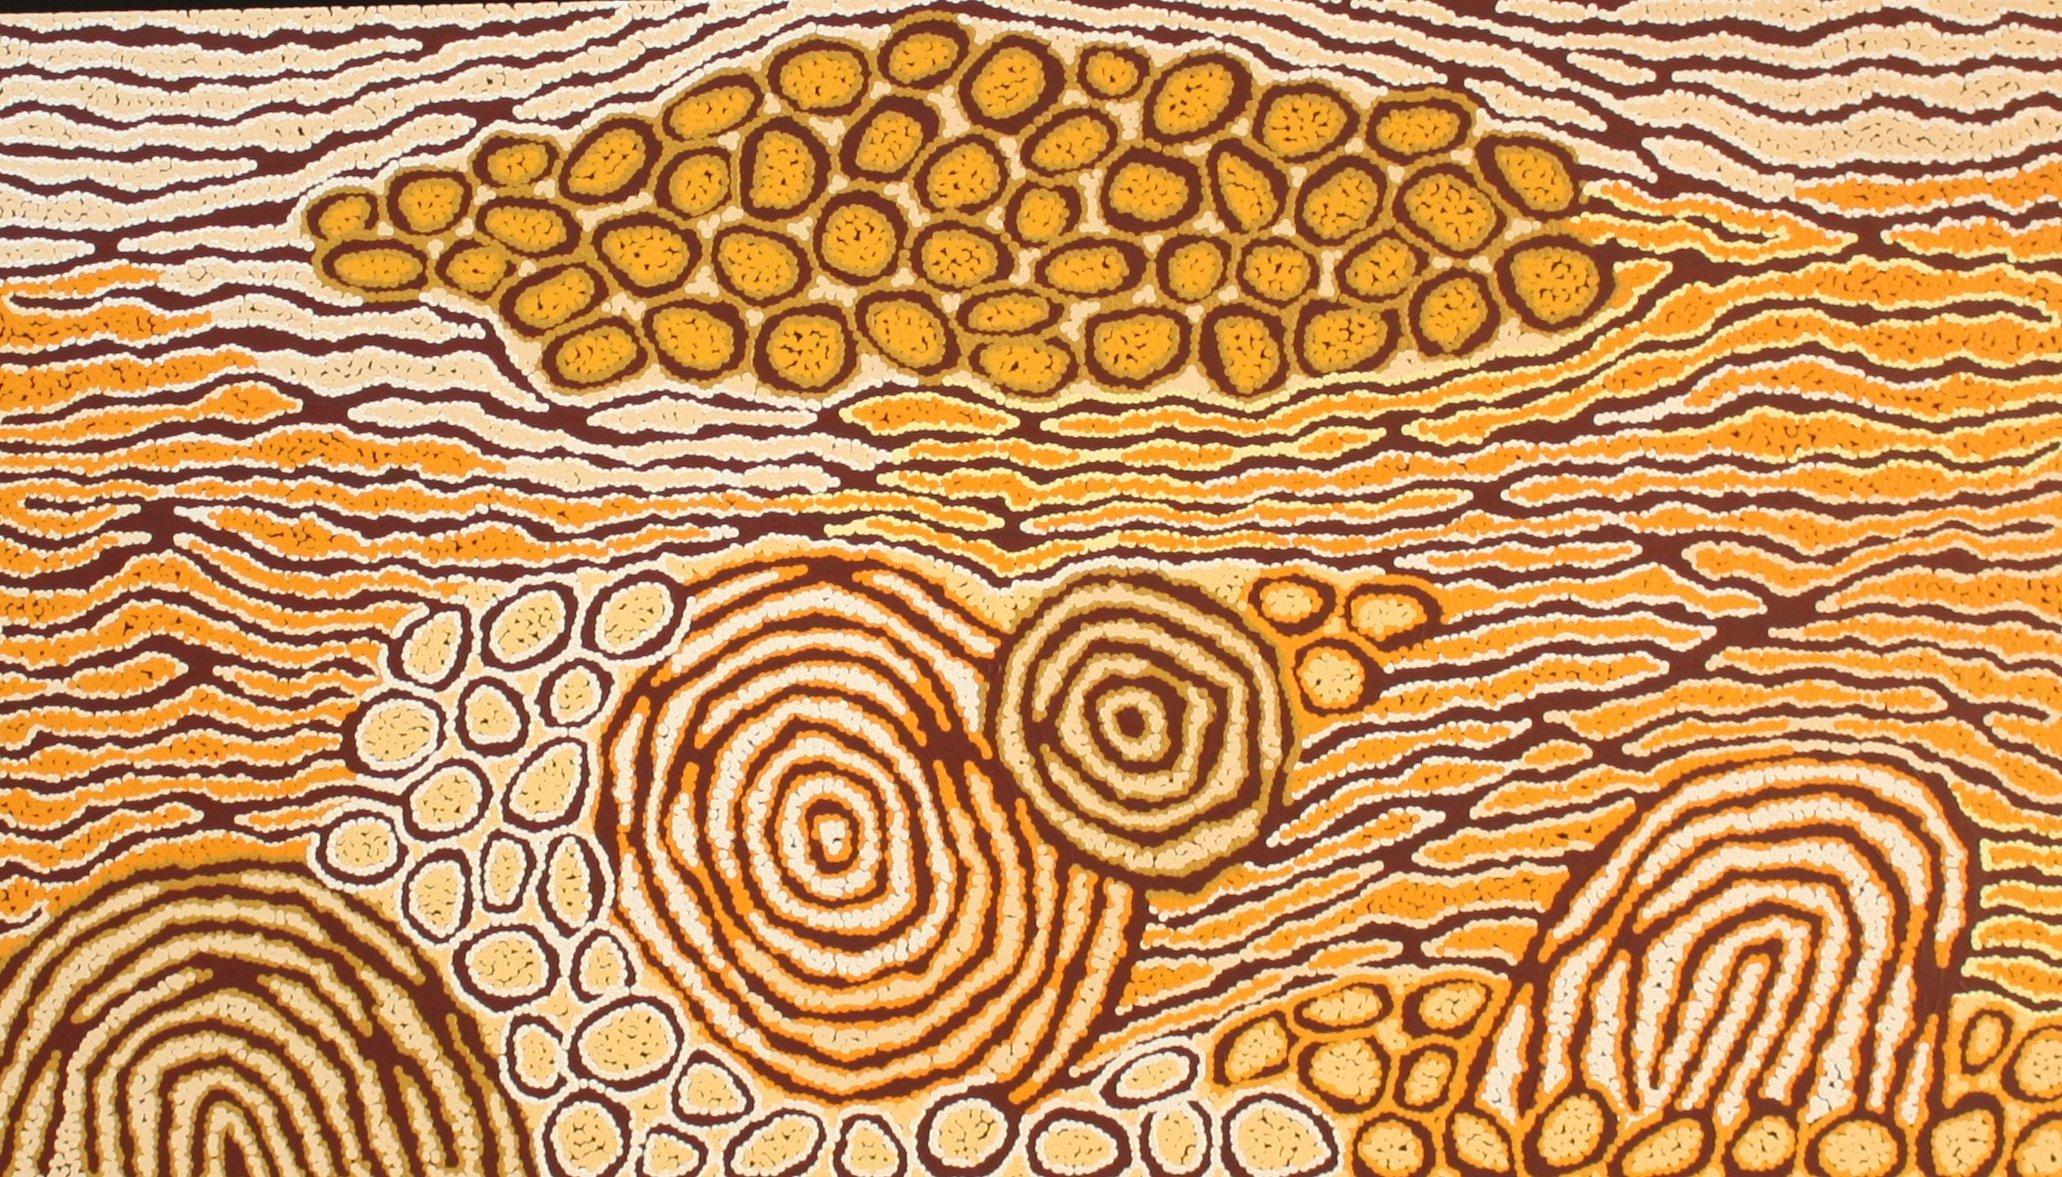 Walangkura Napanangka artwork